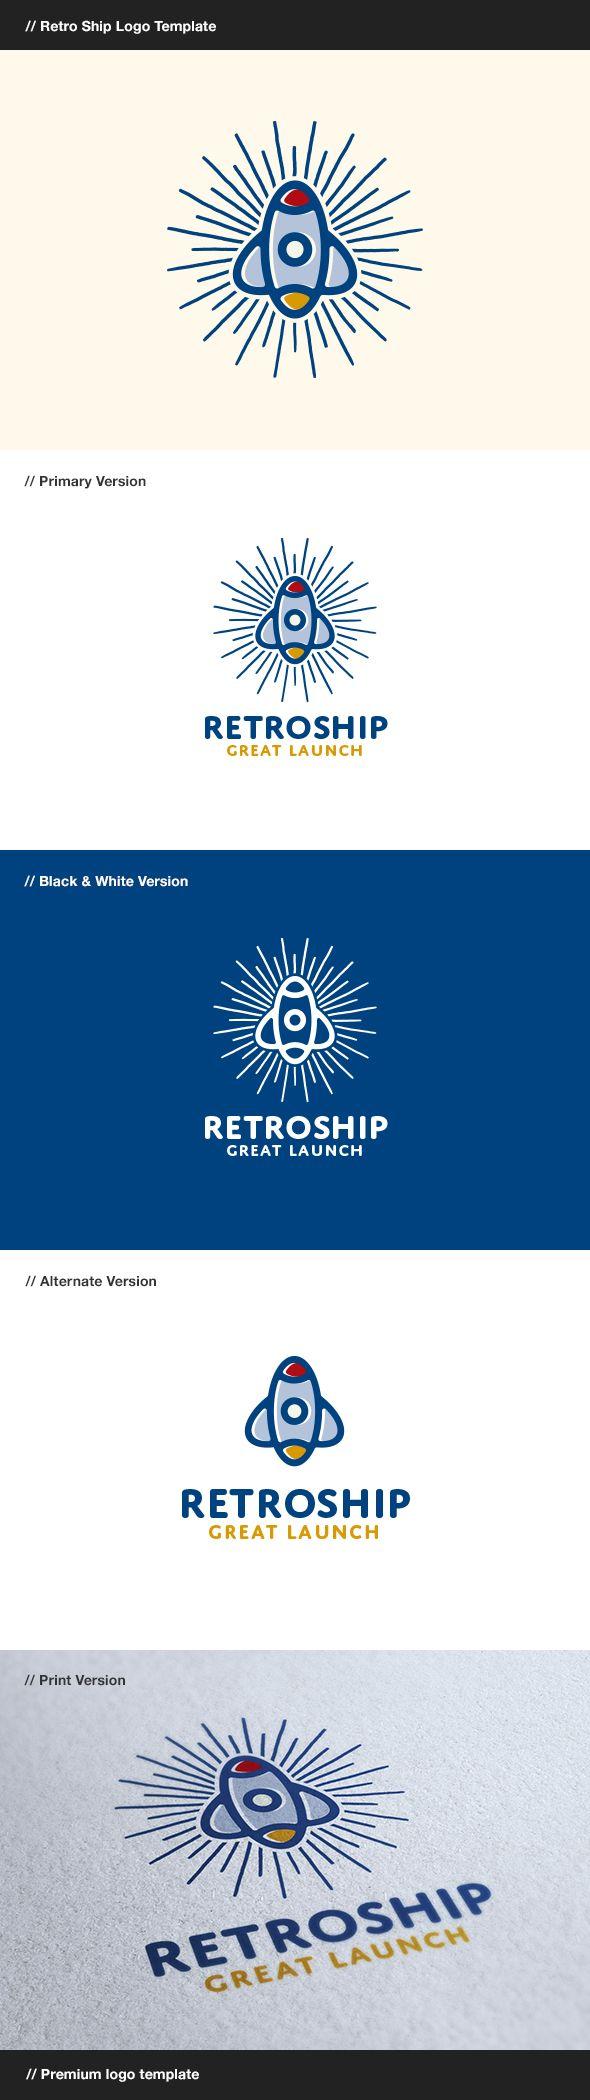 Retro Ship  Rocket Logo — Vector EPS #marketing #multimedia • Download ➝ https://graphicriver.net/item/retro-ship-rocket-logo/8123016?ref=pxcr